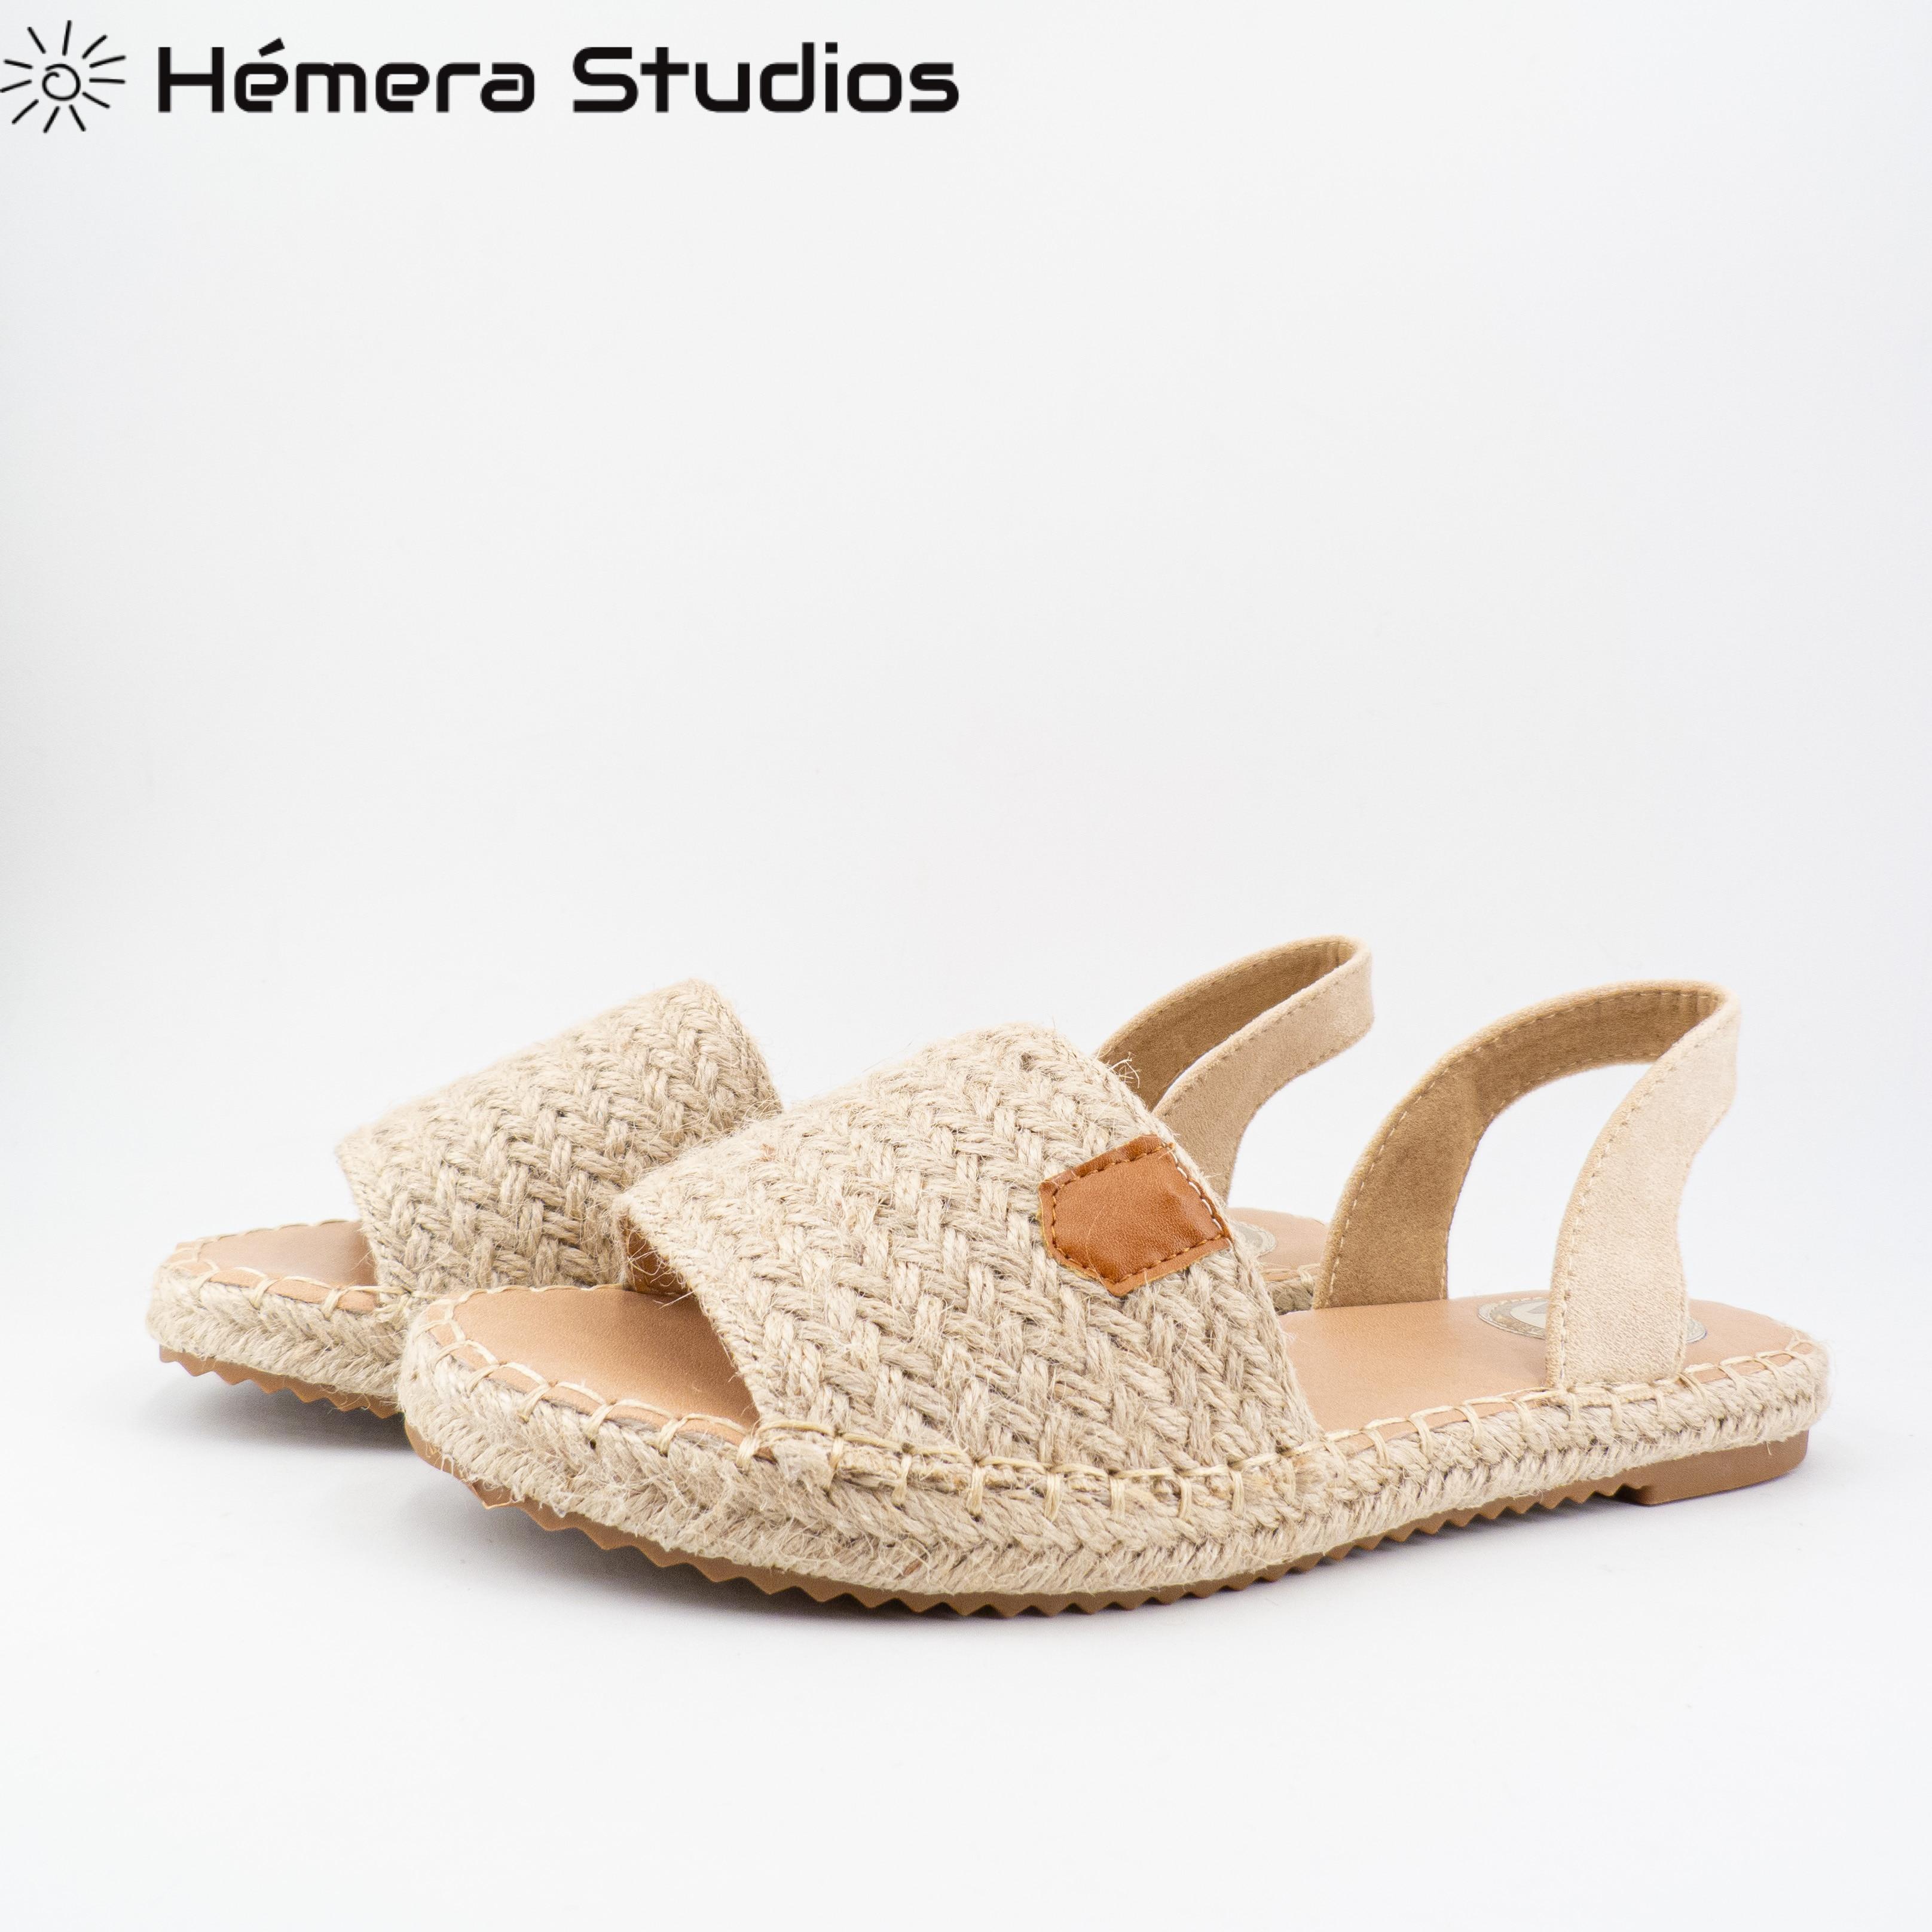 WOMAN Sandals 2020 SUMMER Menorquina ESPARTOS BUCKLE Platform Wedge Beach Open Espadrille Animal Print Multicolor